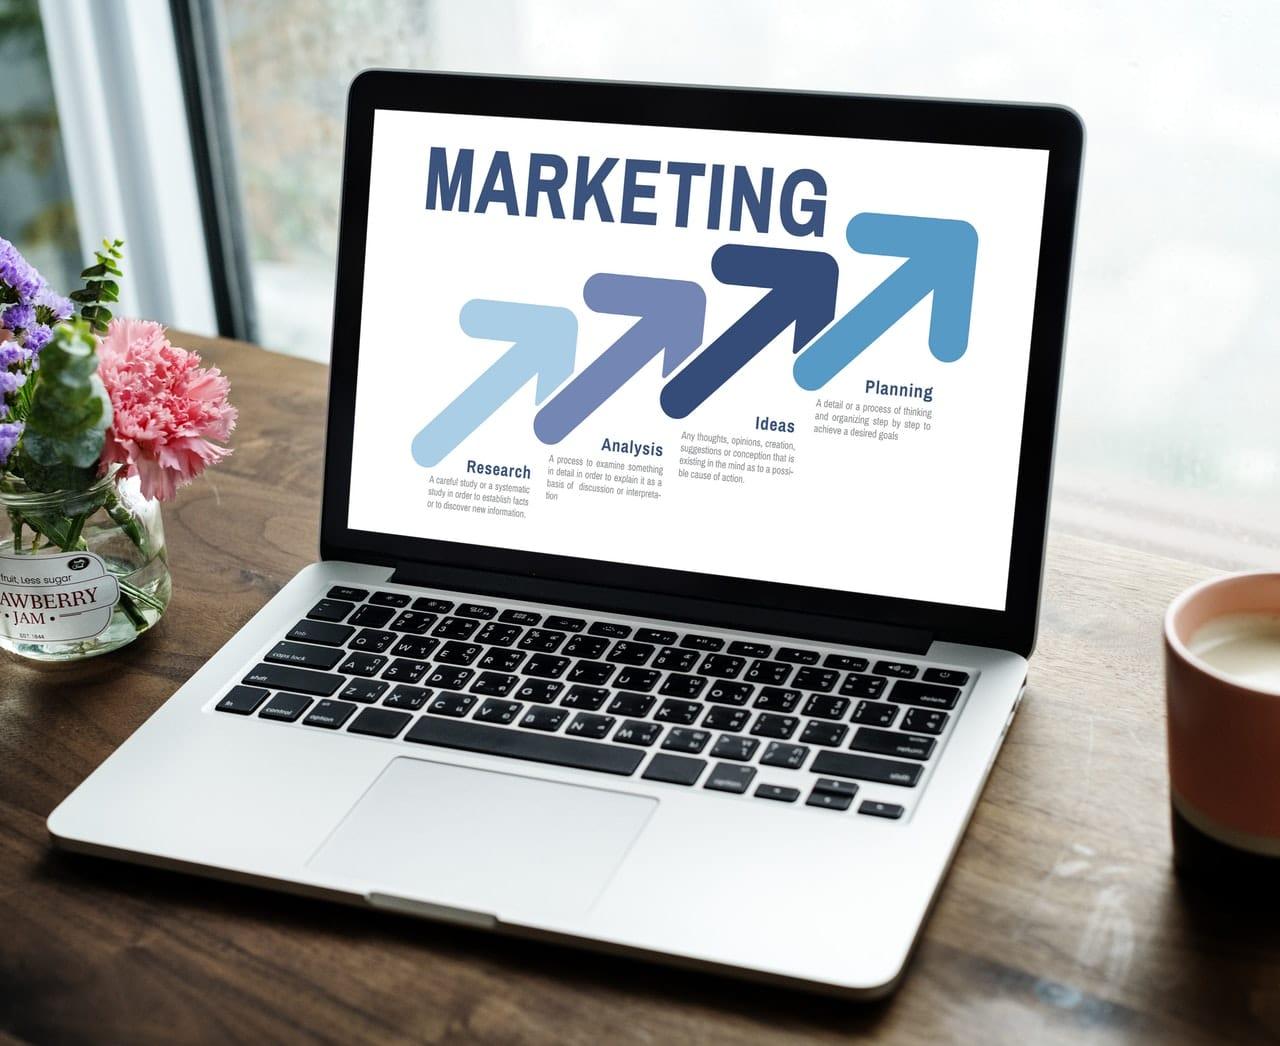 5 Marketing Ideas Header Image